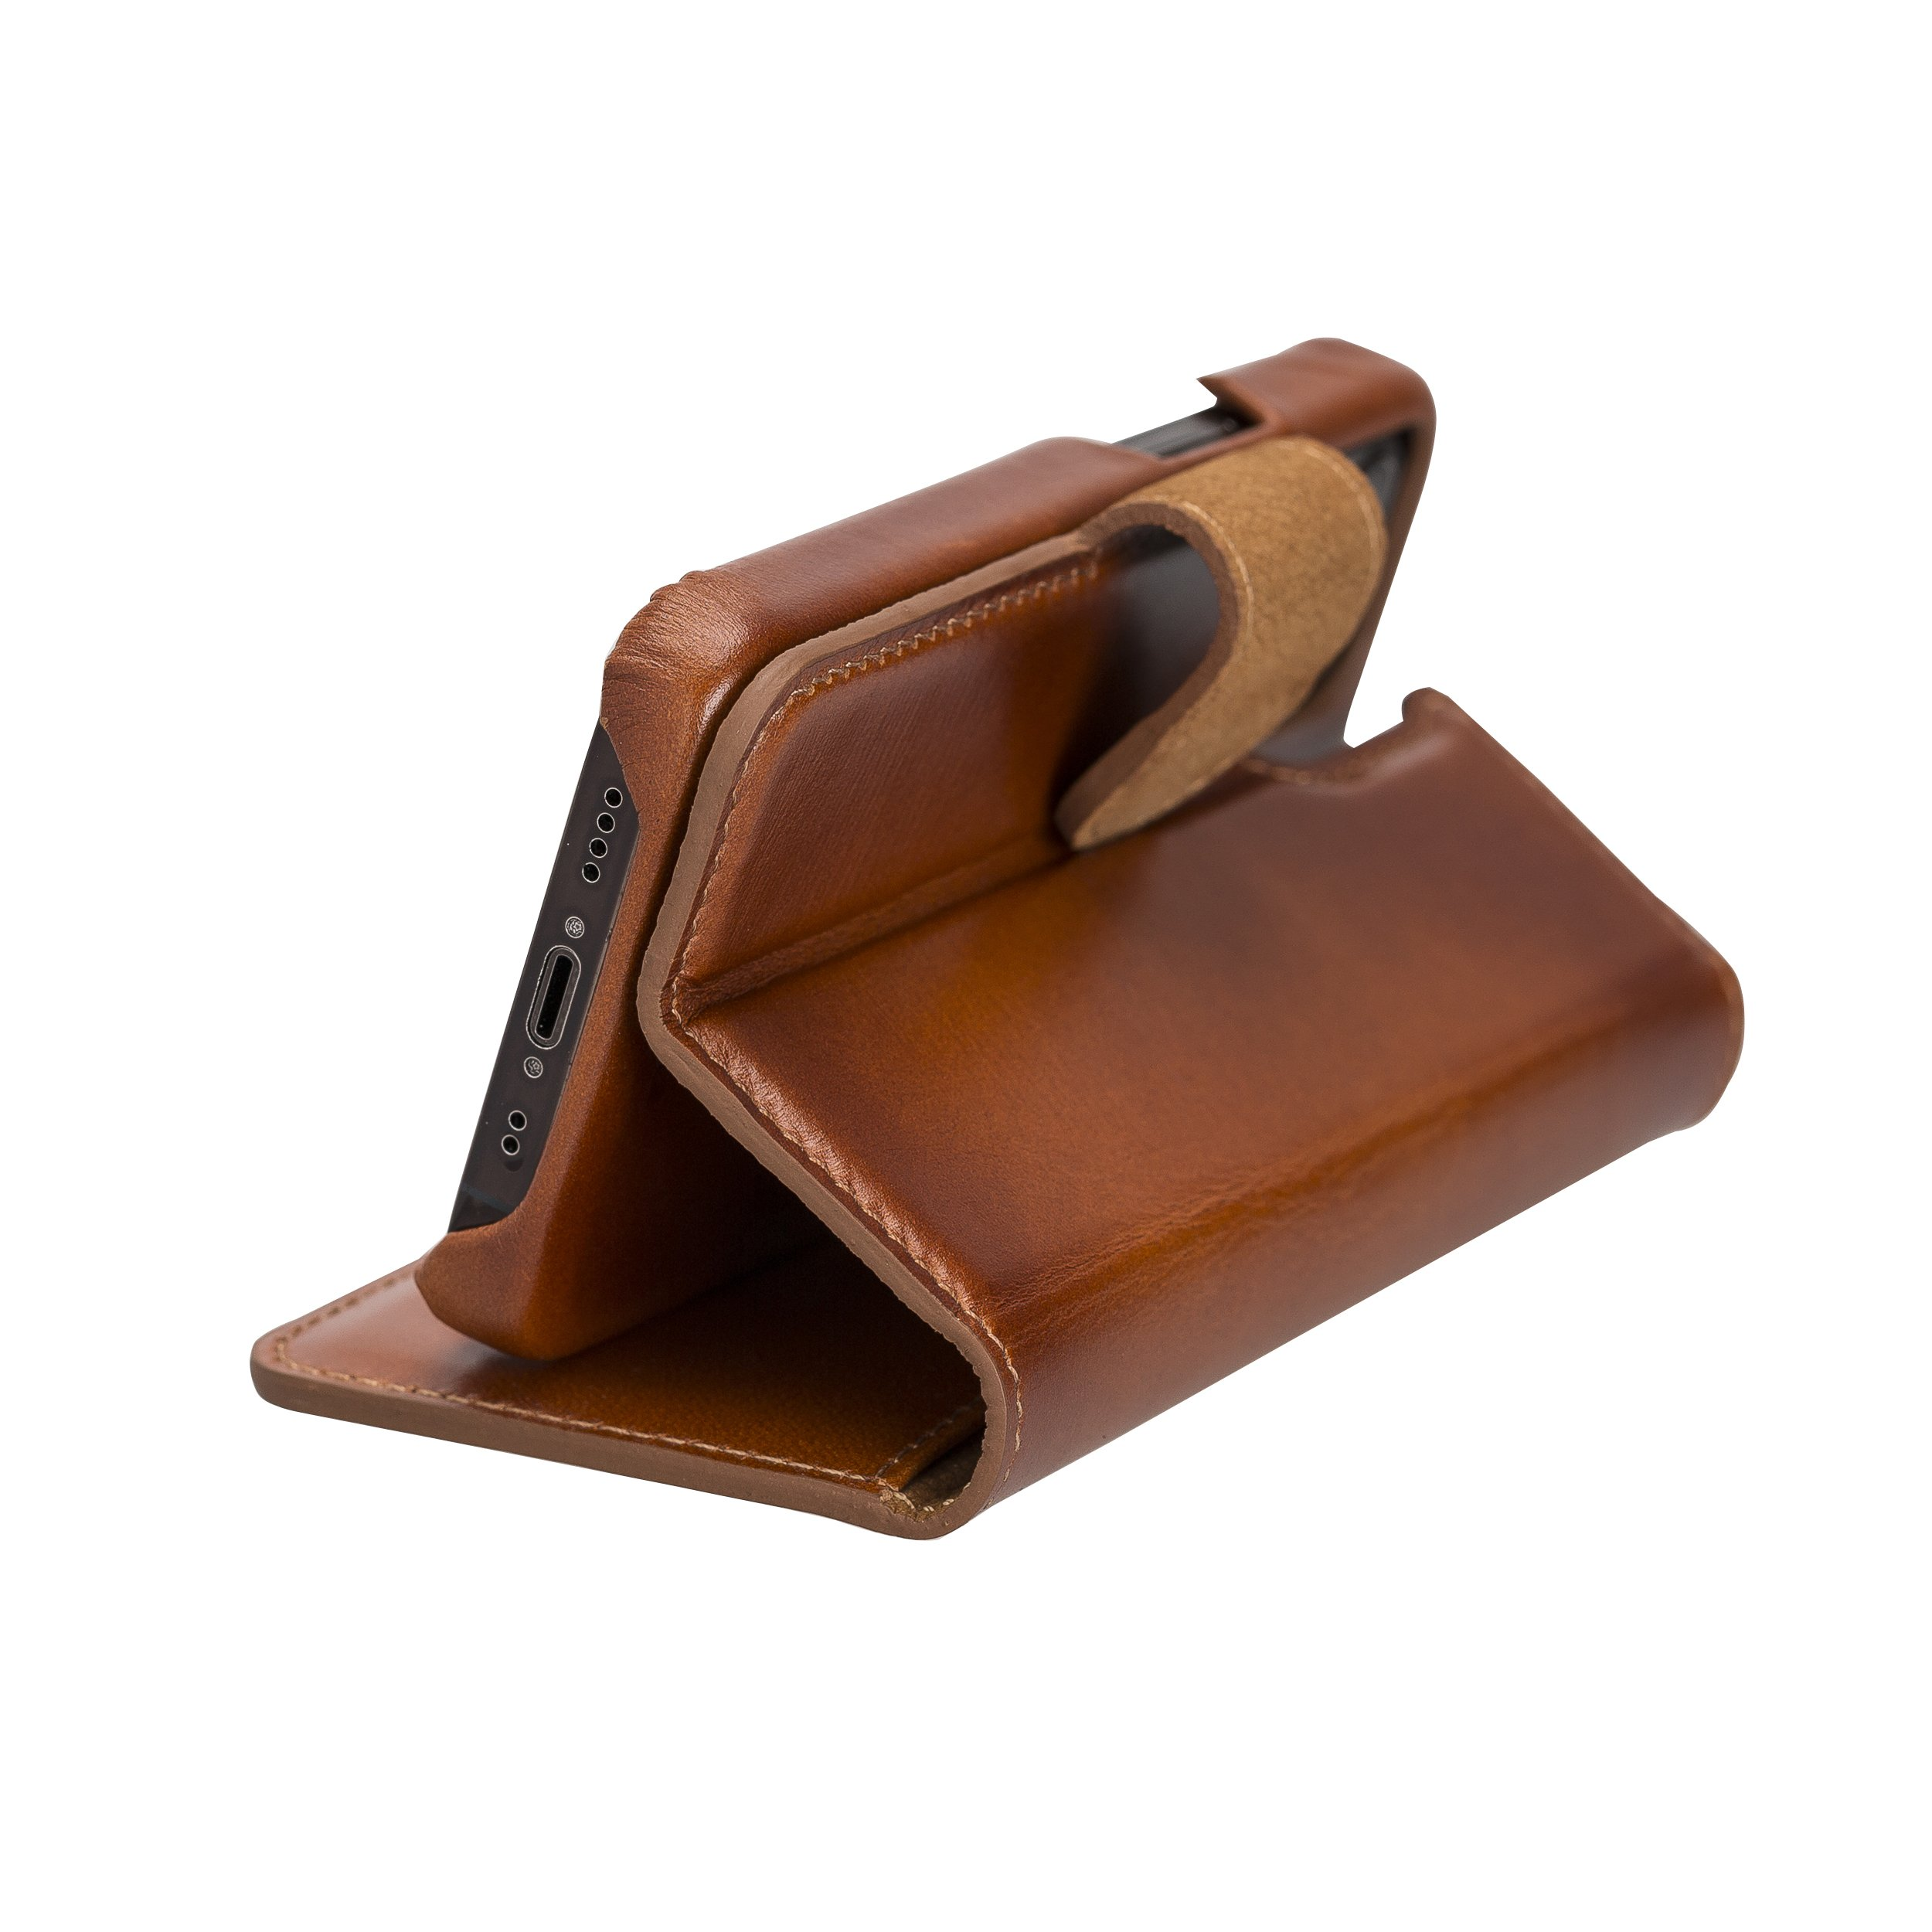 "iPhone 12 Mini abnehmbare Lederhülle ""Clemson"" MagSafe kompatibel (Vollleder Cognac Braun)"